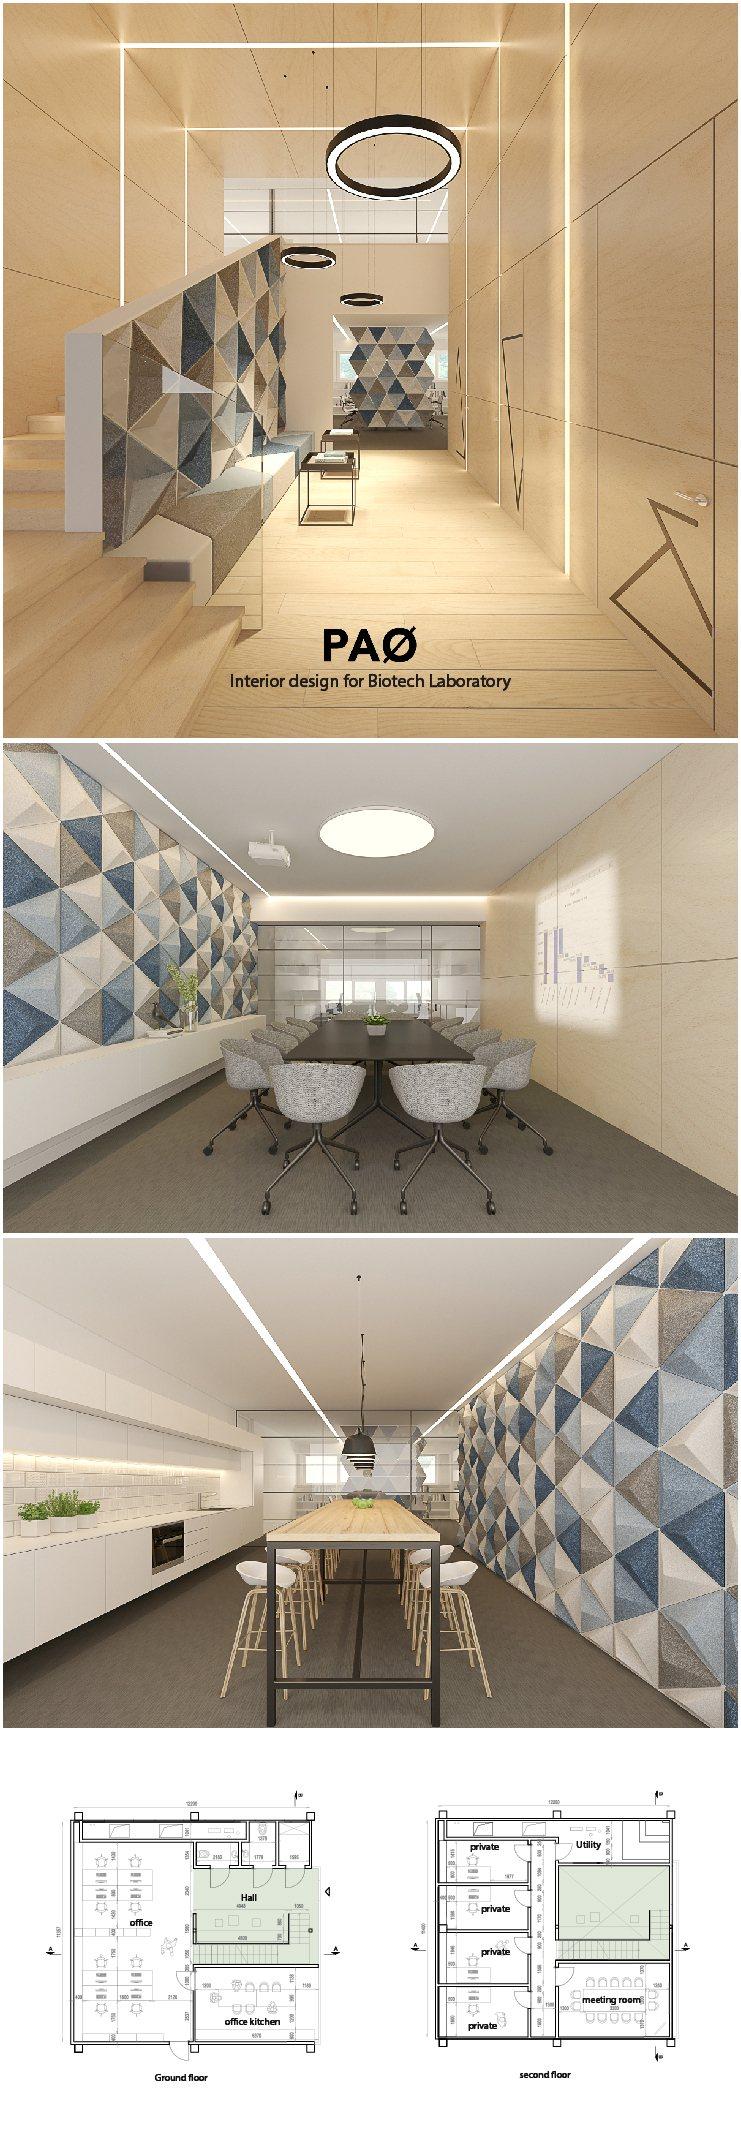 Modern office interior BOD - 200 sq.m. | 2150 sq.ft.